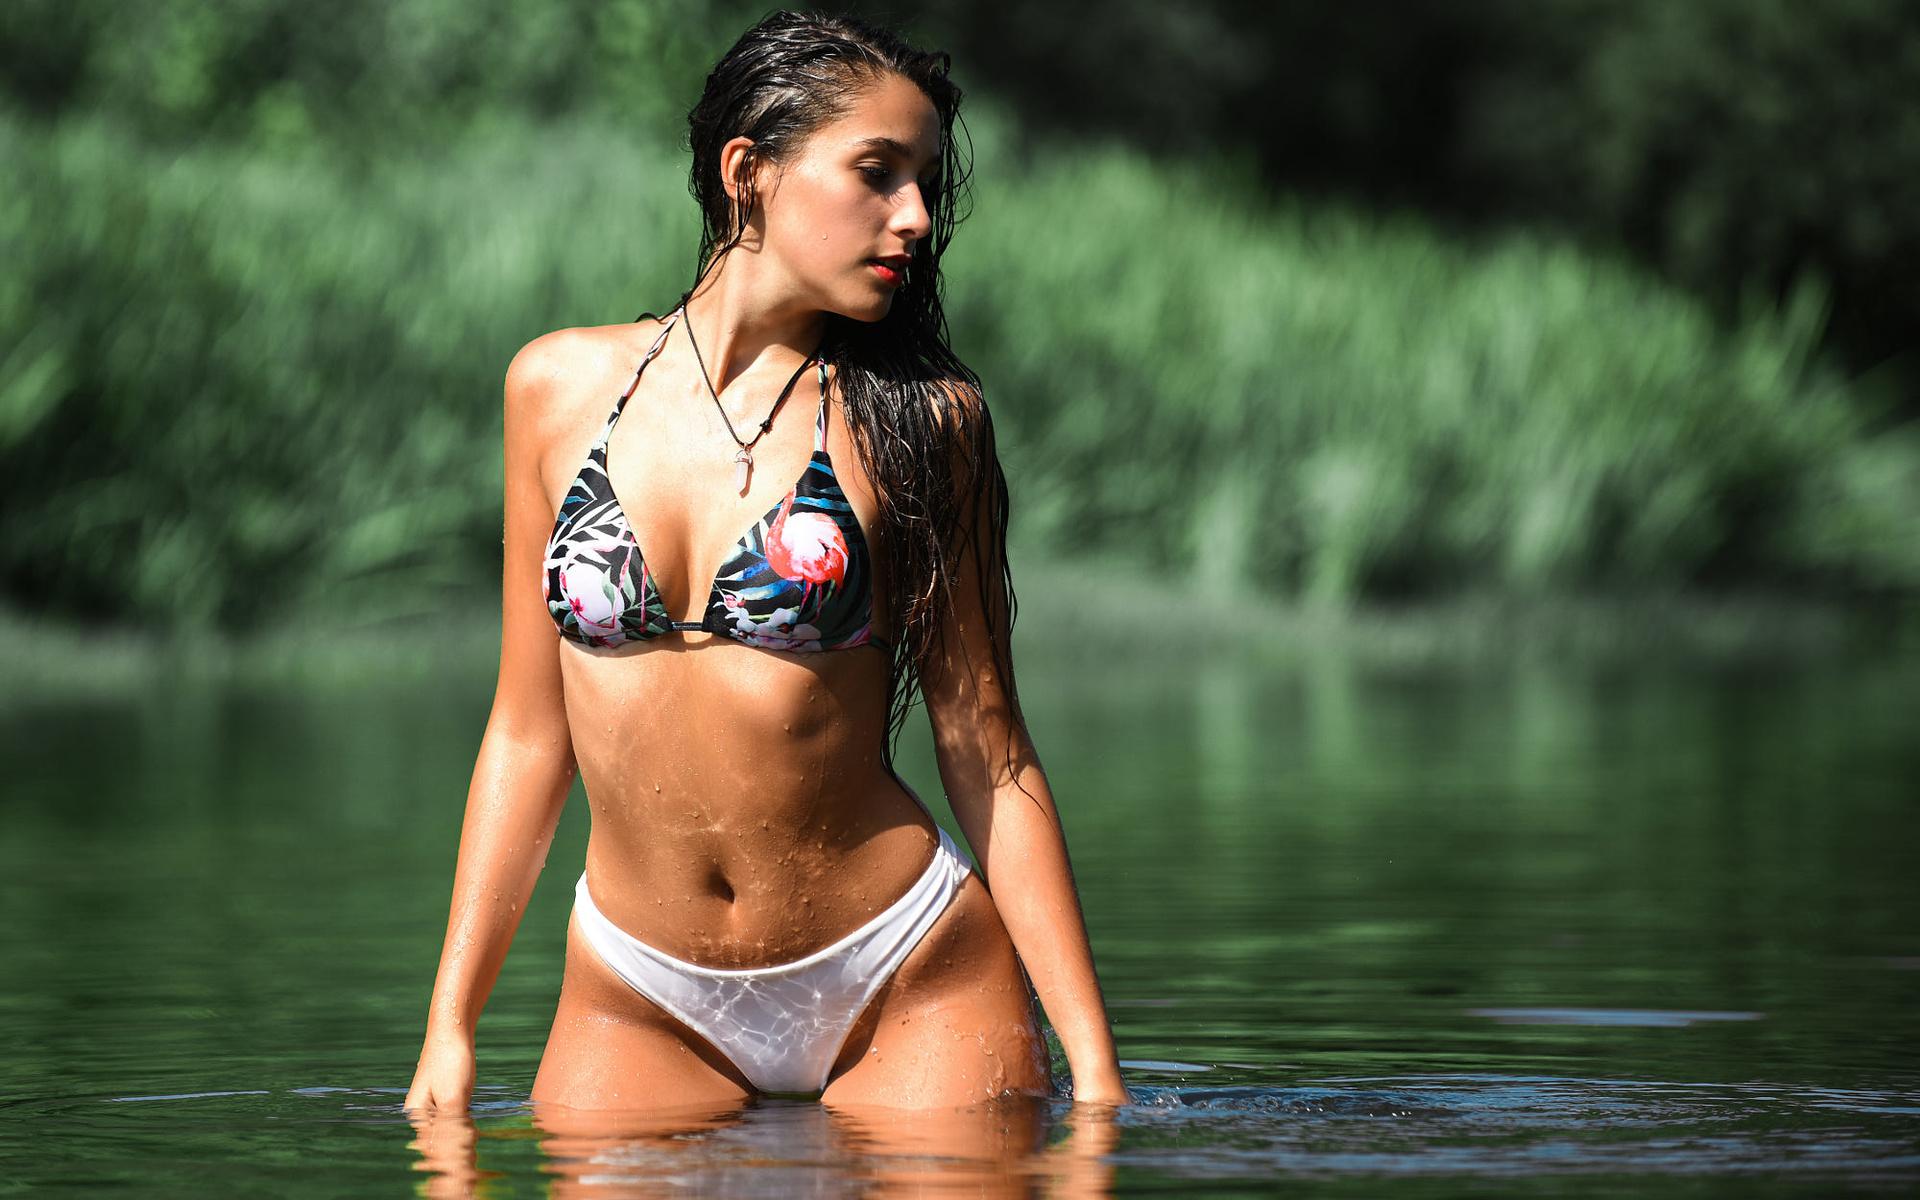 women, red lipstick, belly, long hair, swimwear, bikini, river, brunette, women outdoors, wet body, wet hair